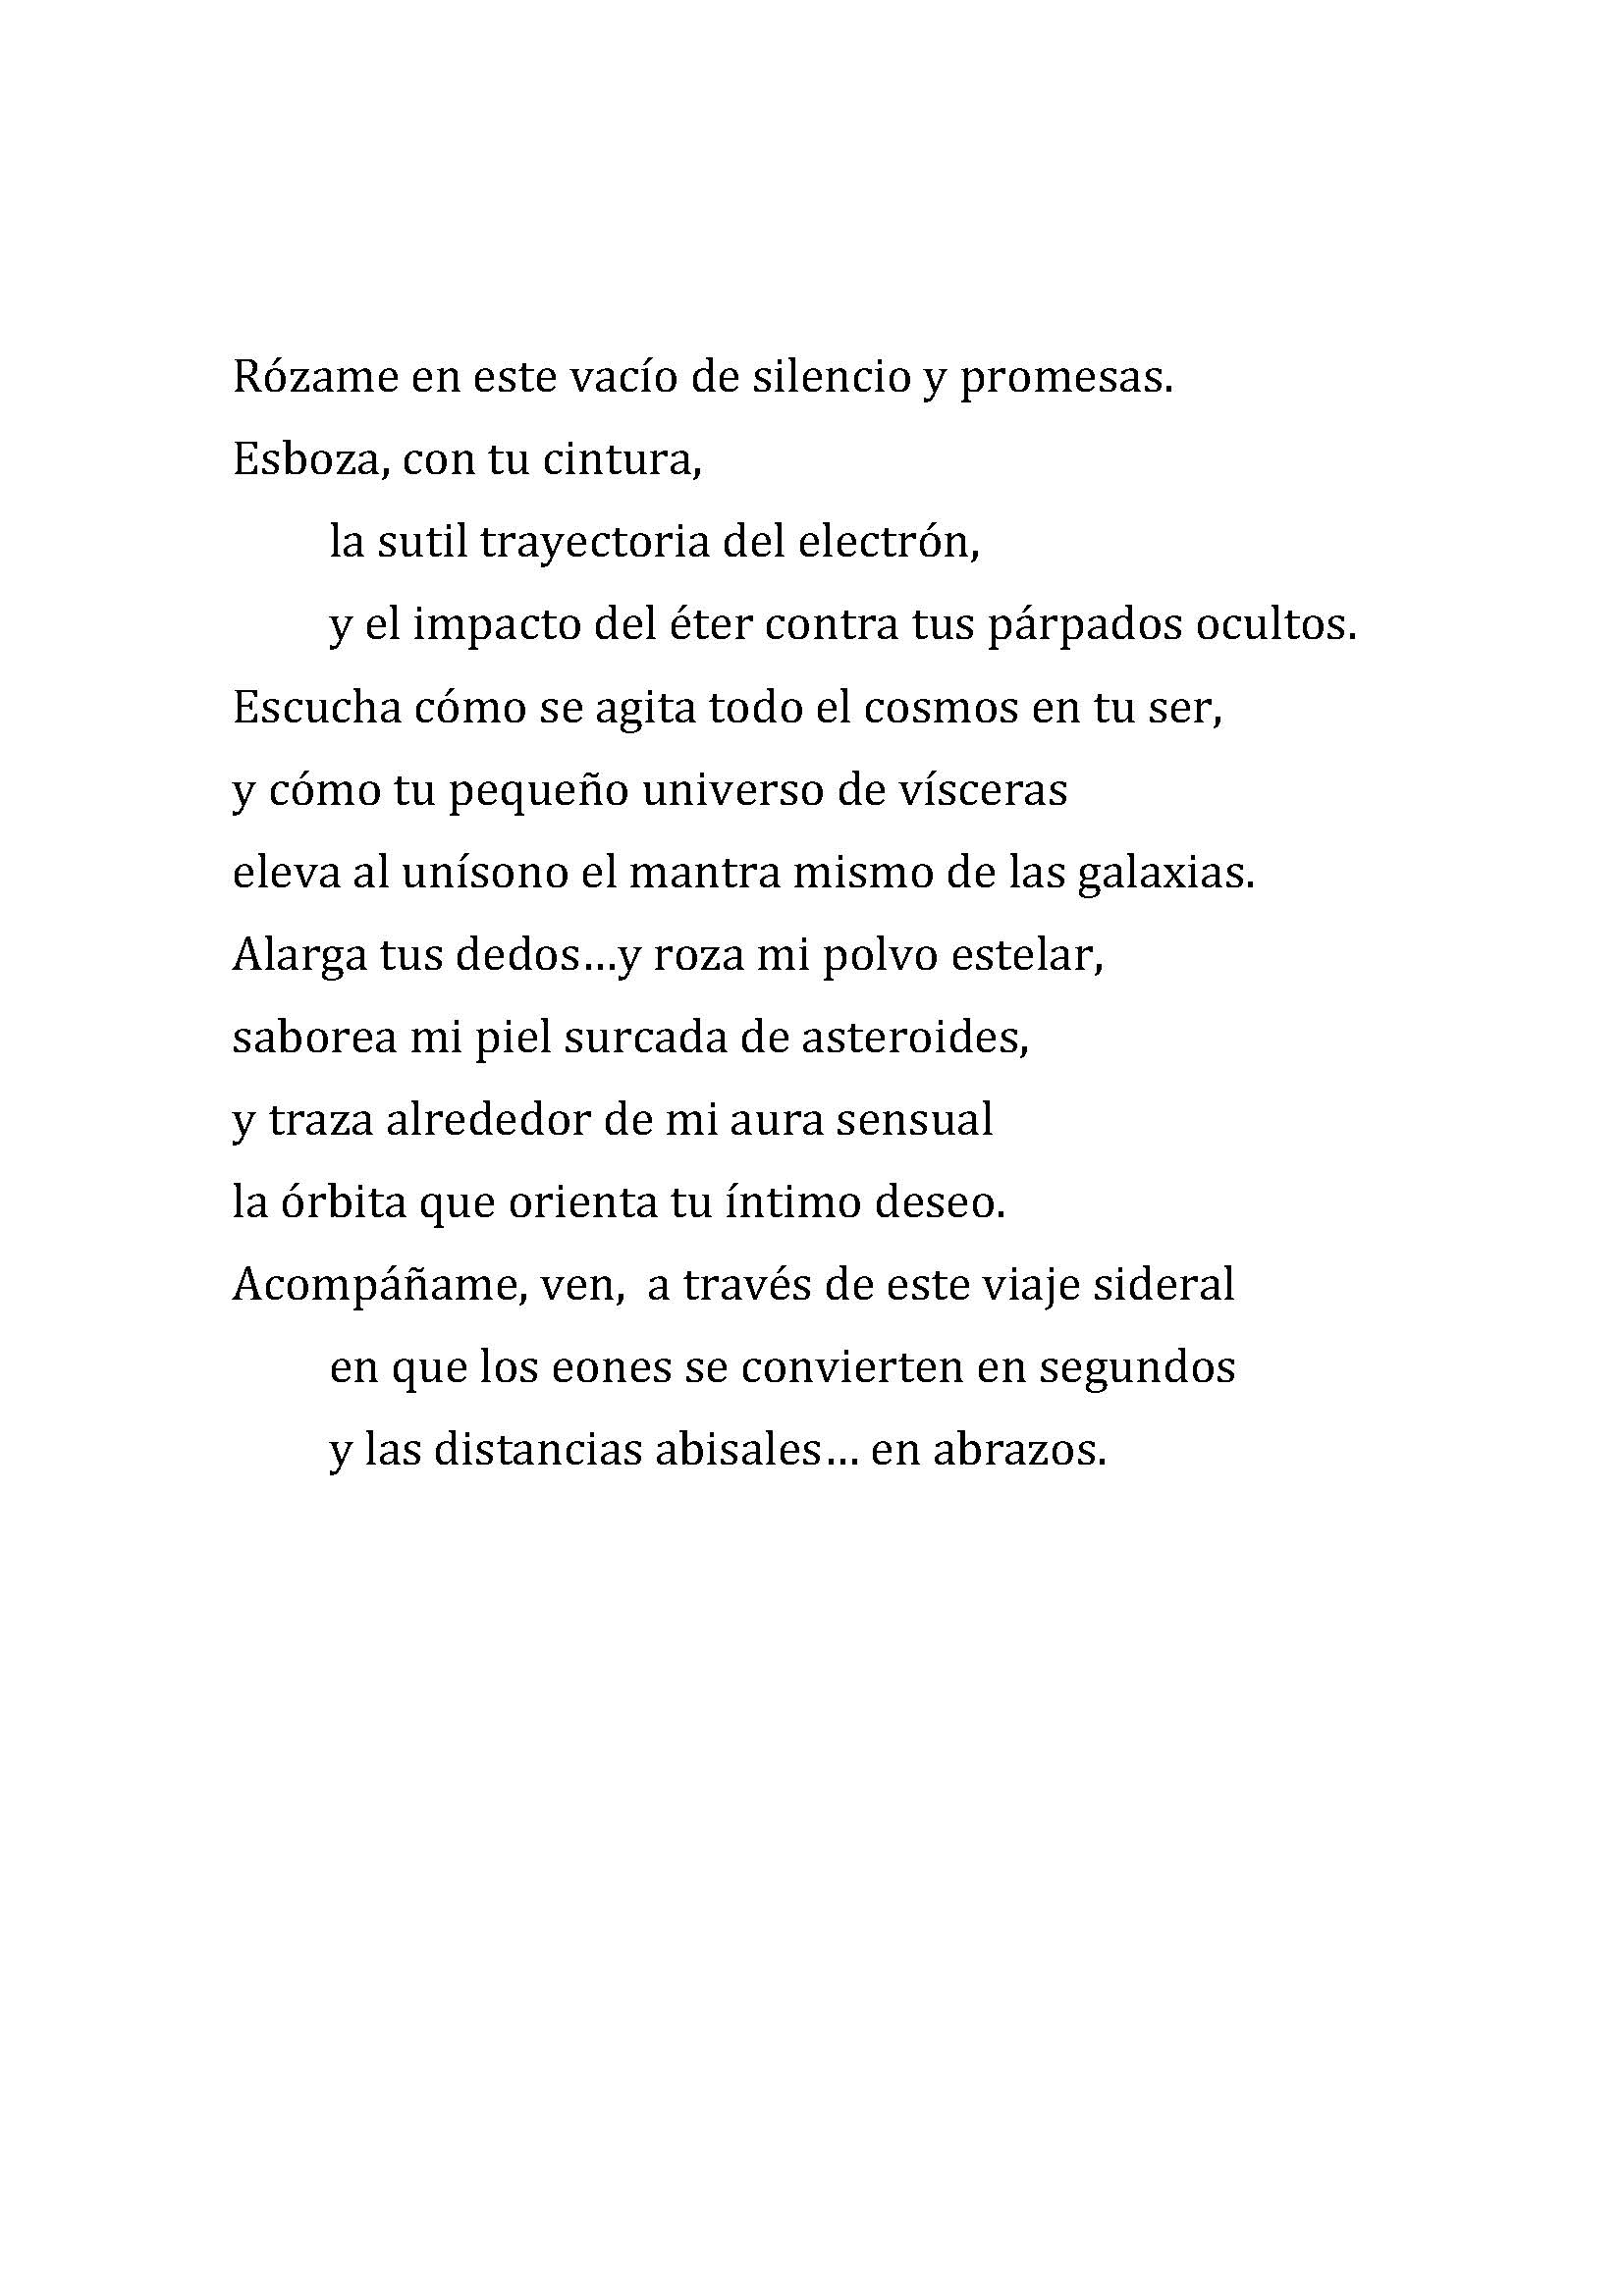 Otro Poema Para Ibiza Rui Valdivia